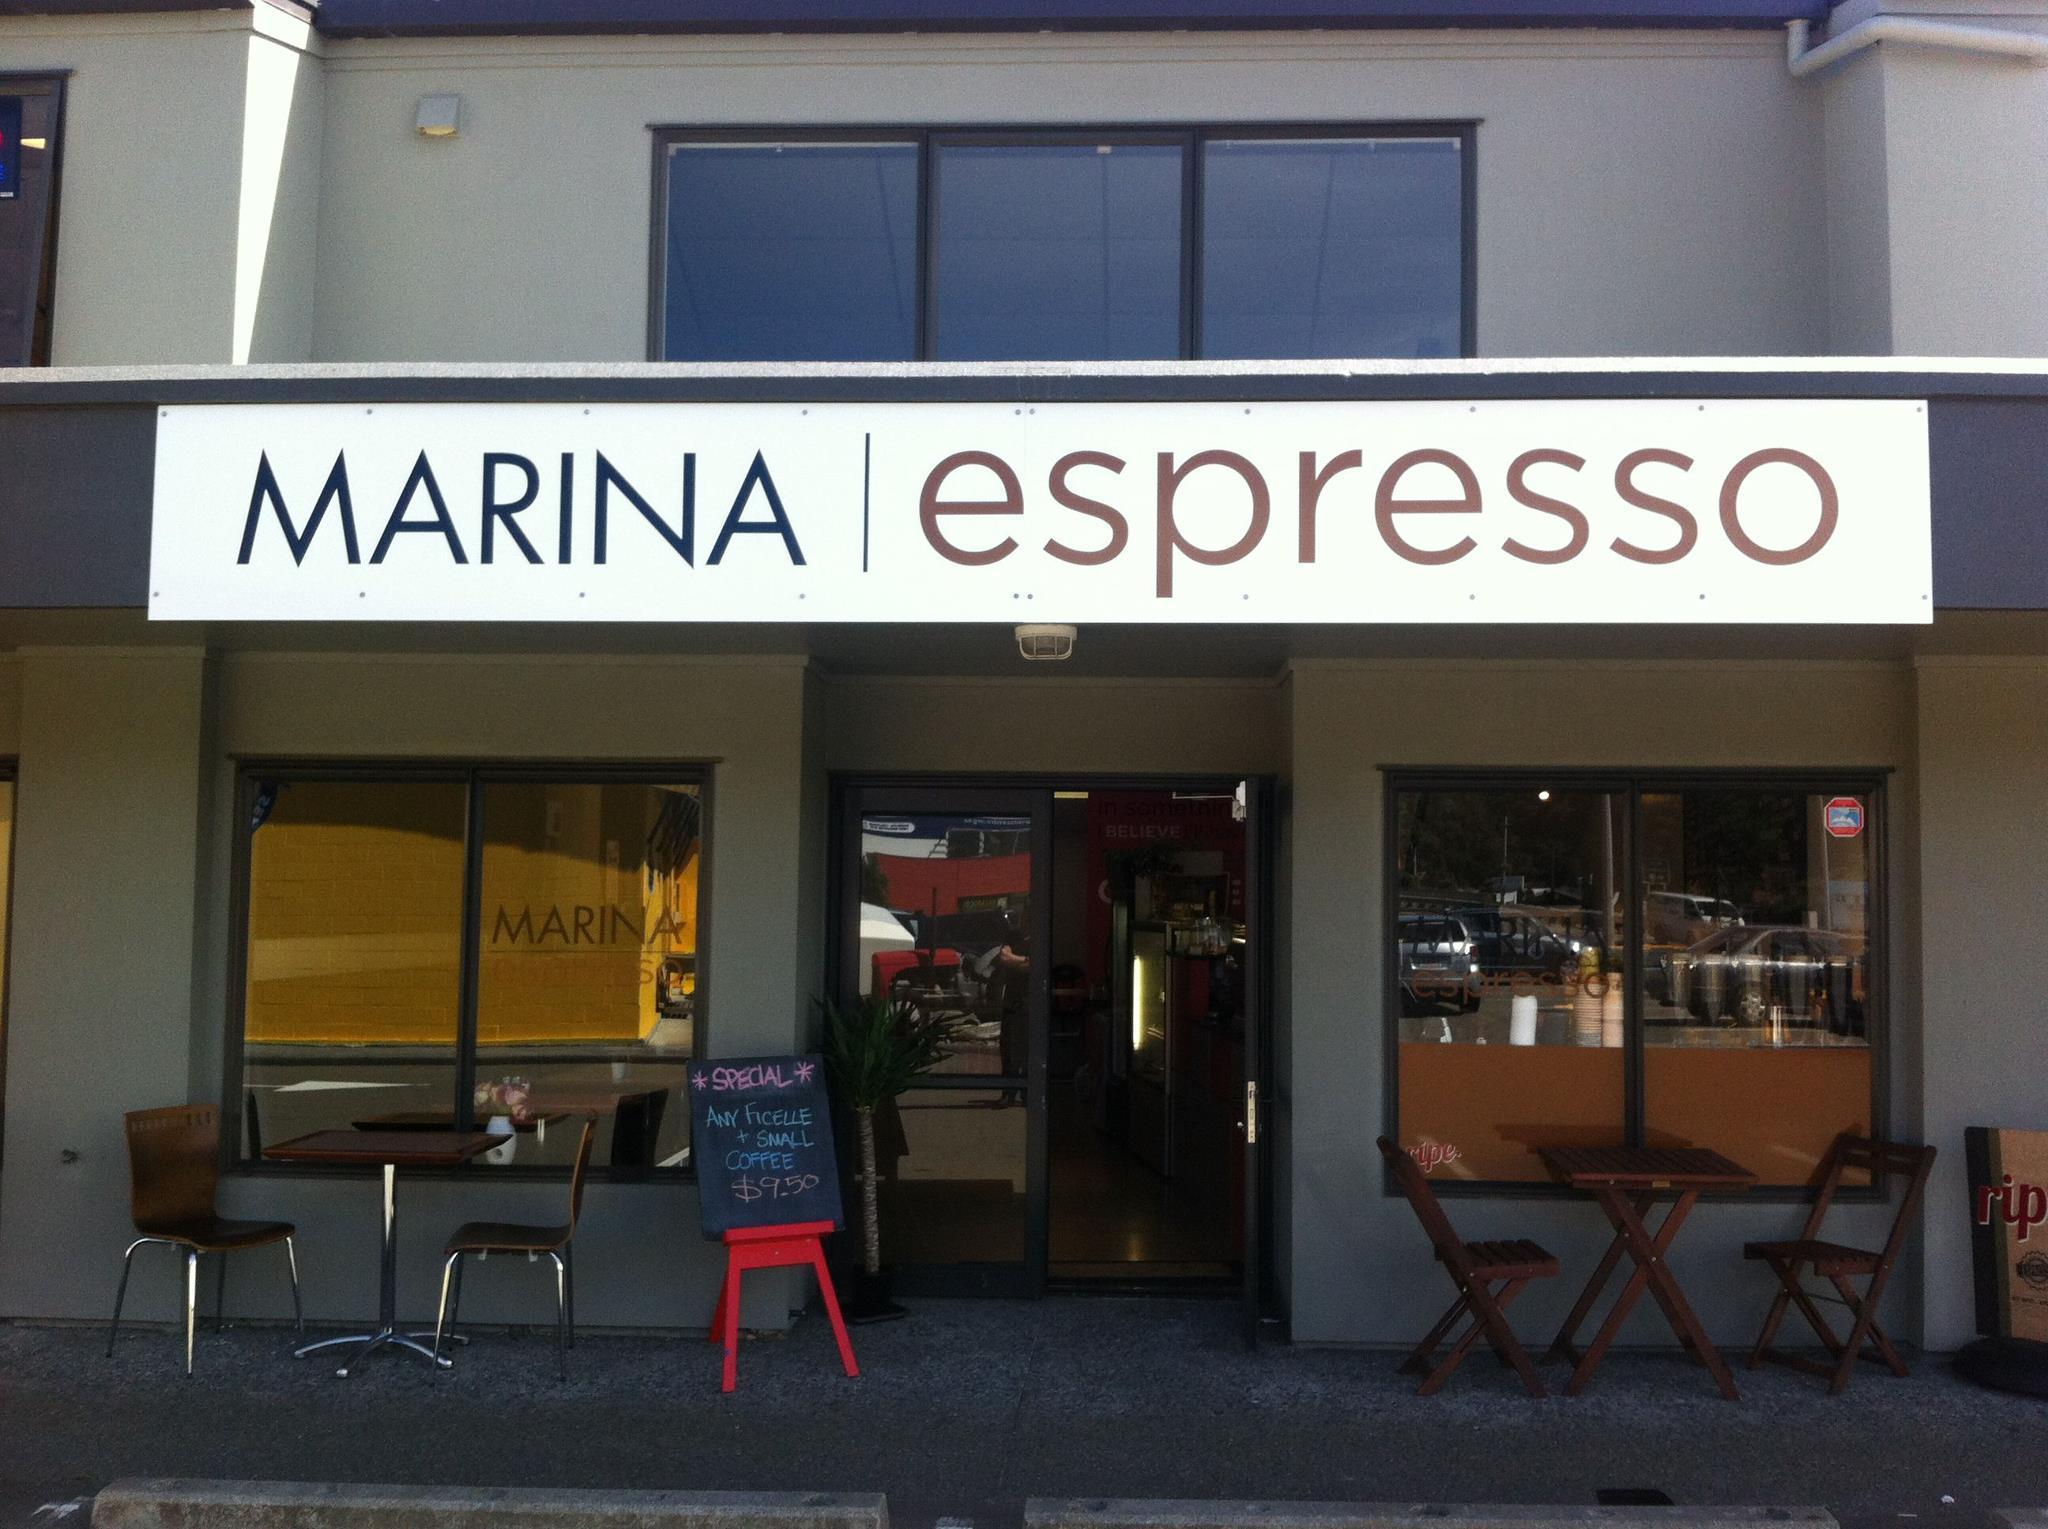 Marina Espresso